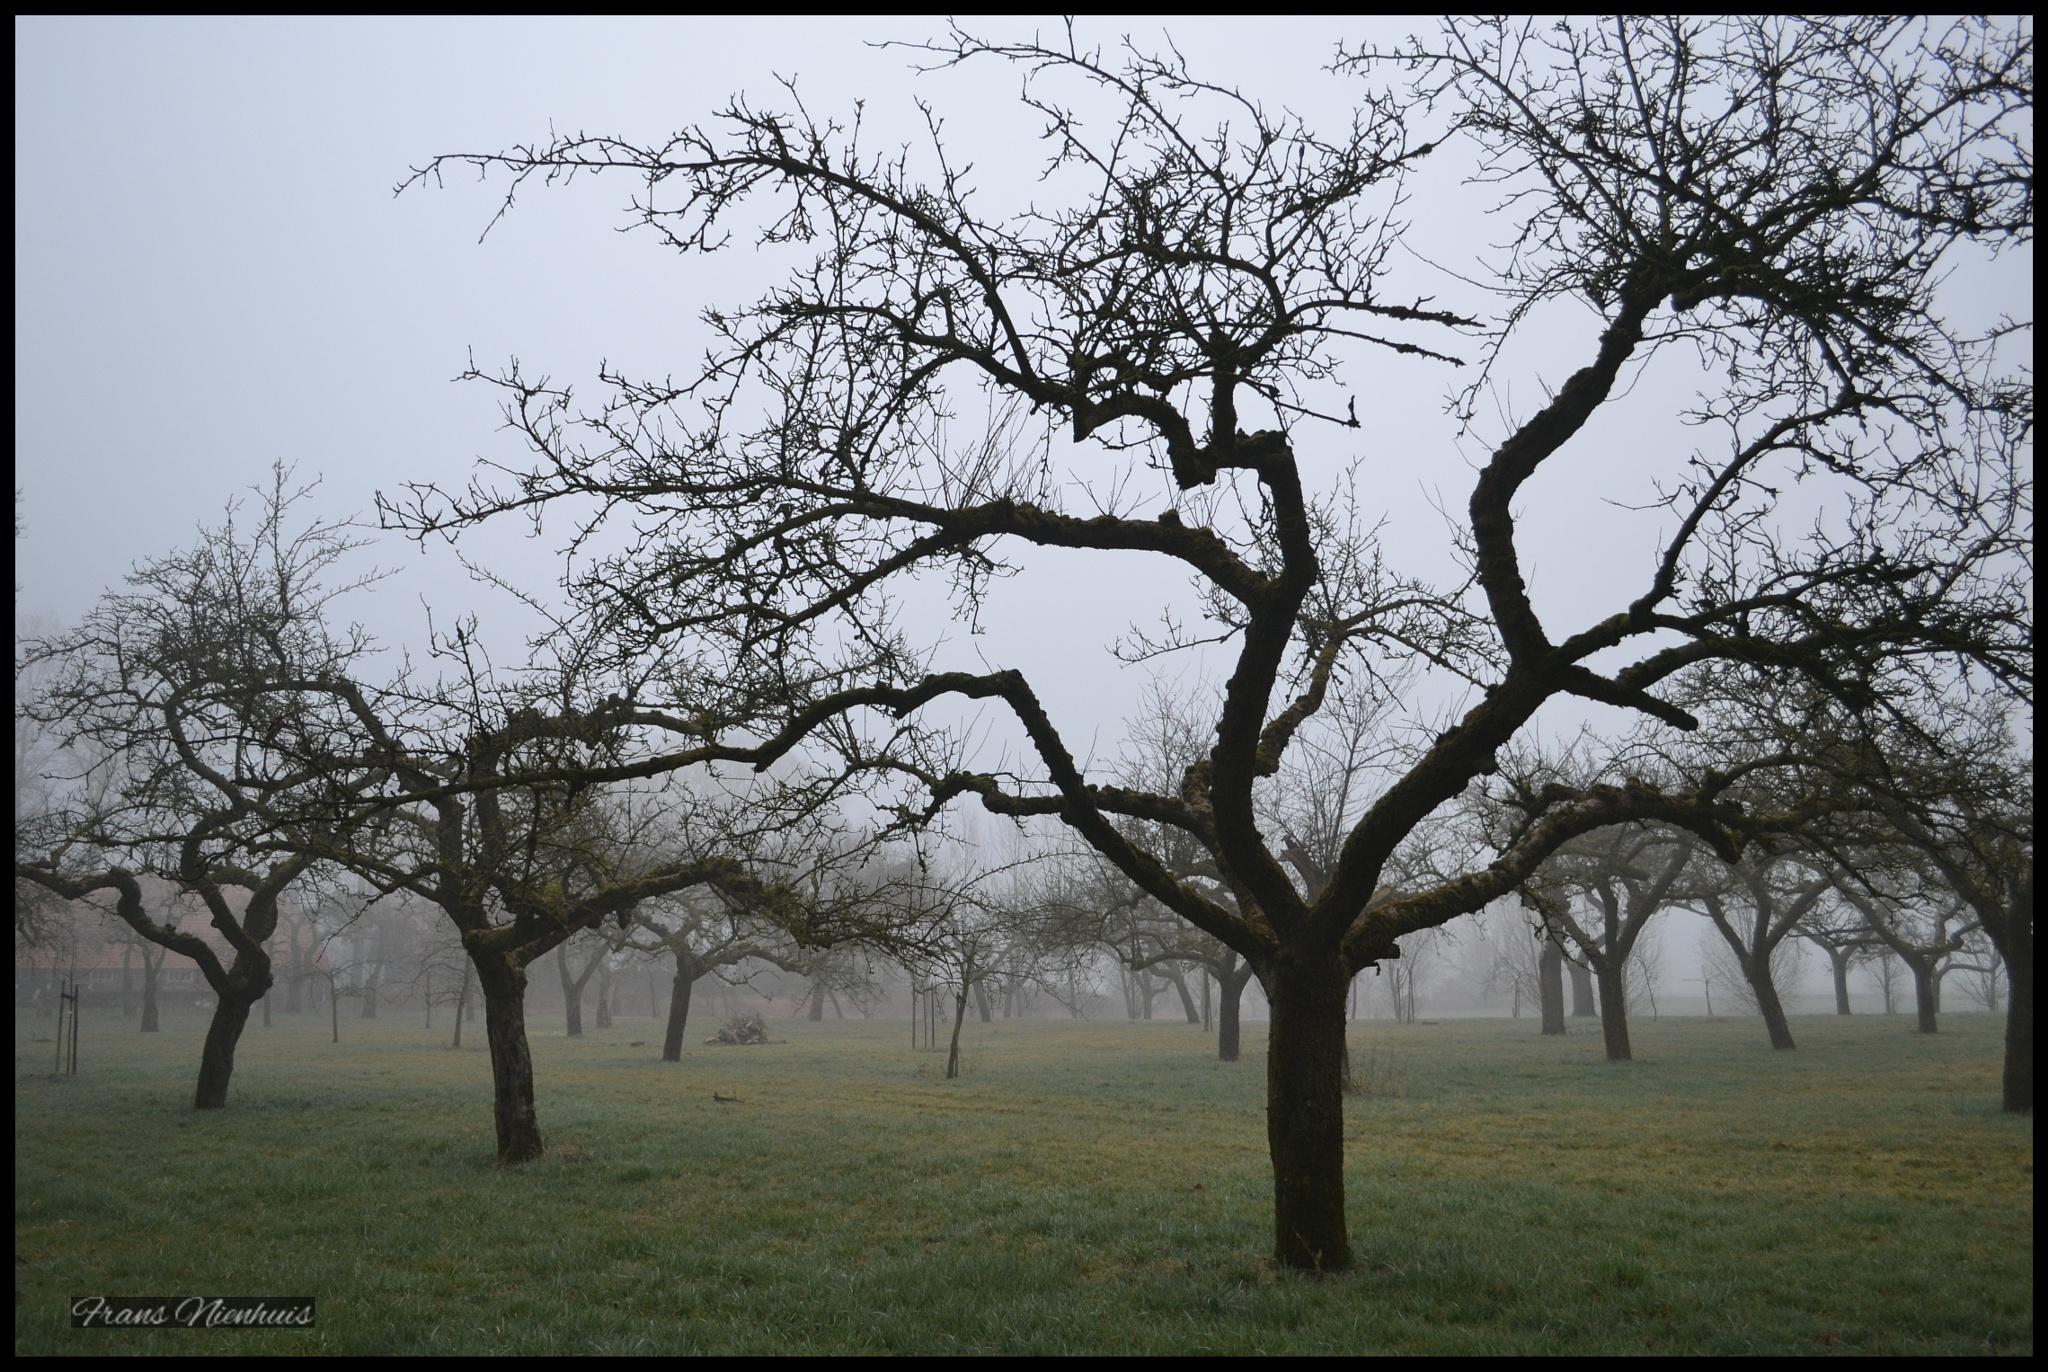 Apple trees in morning mist by Frans Nienhuis